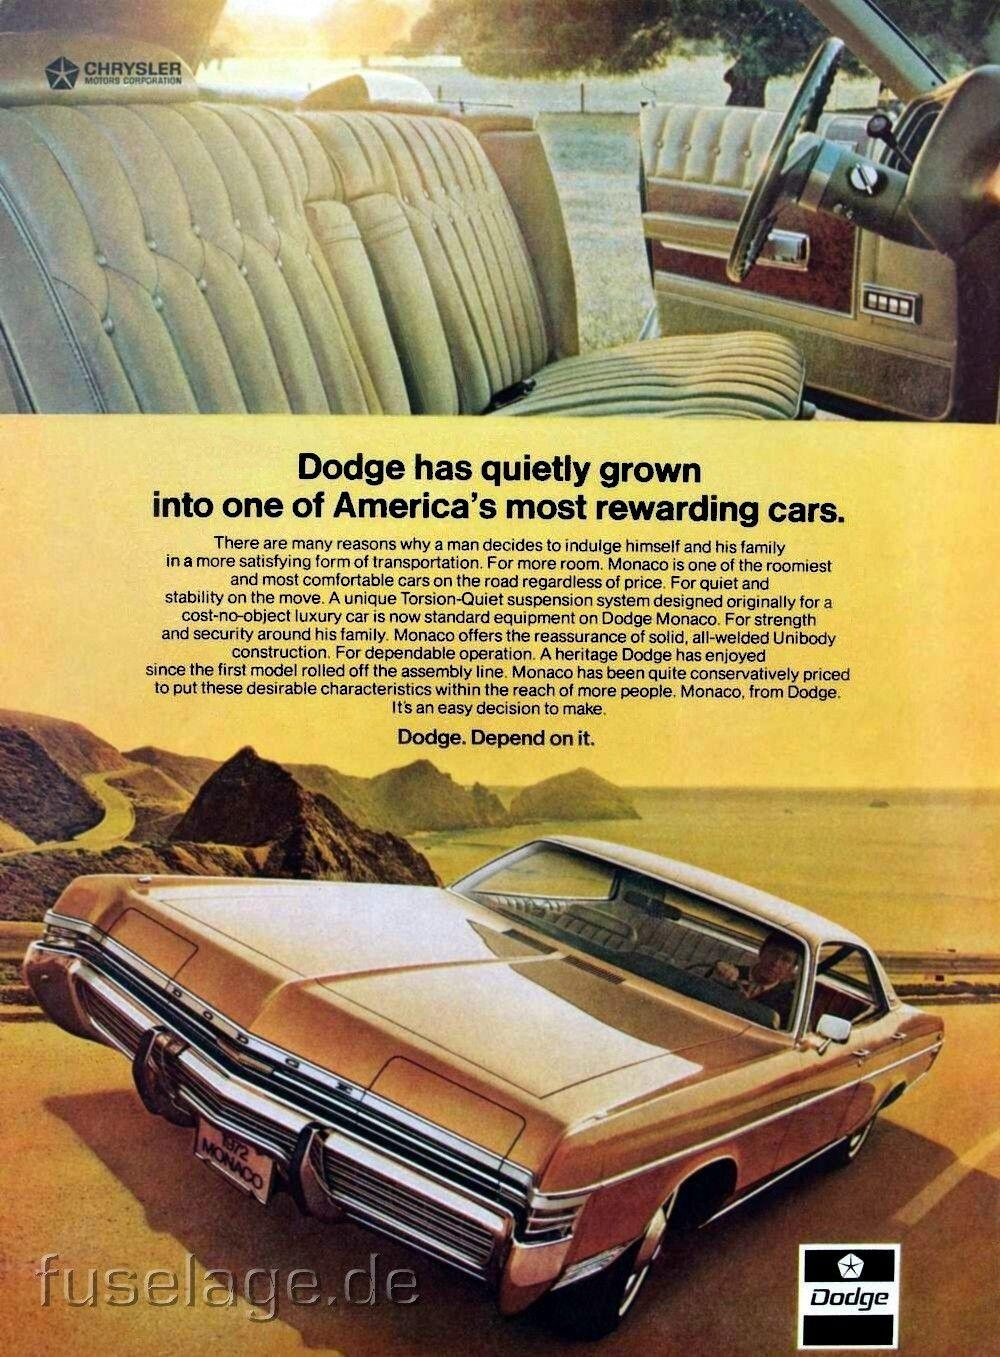 1972 dodge monaco classic ads pinterest anuncios de carros 1972 dodge monaco fandeluxe Image collections